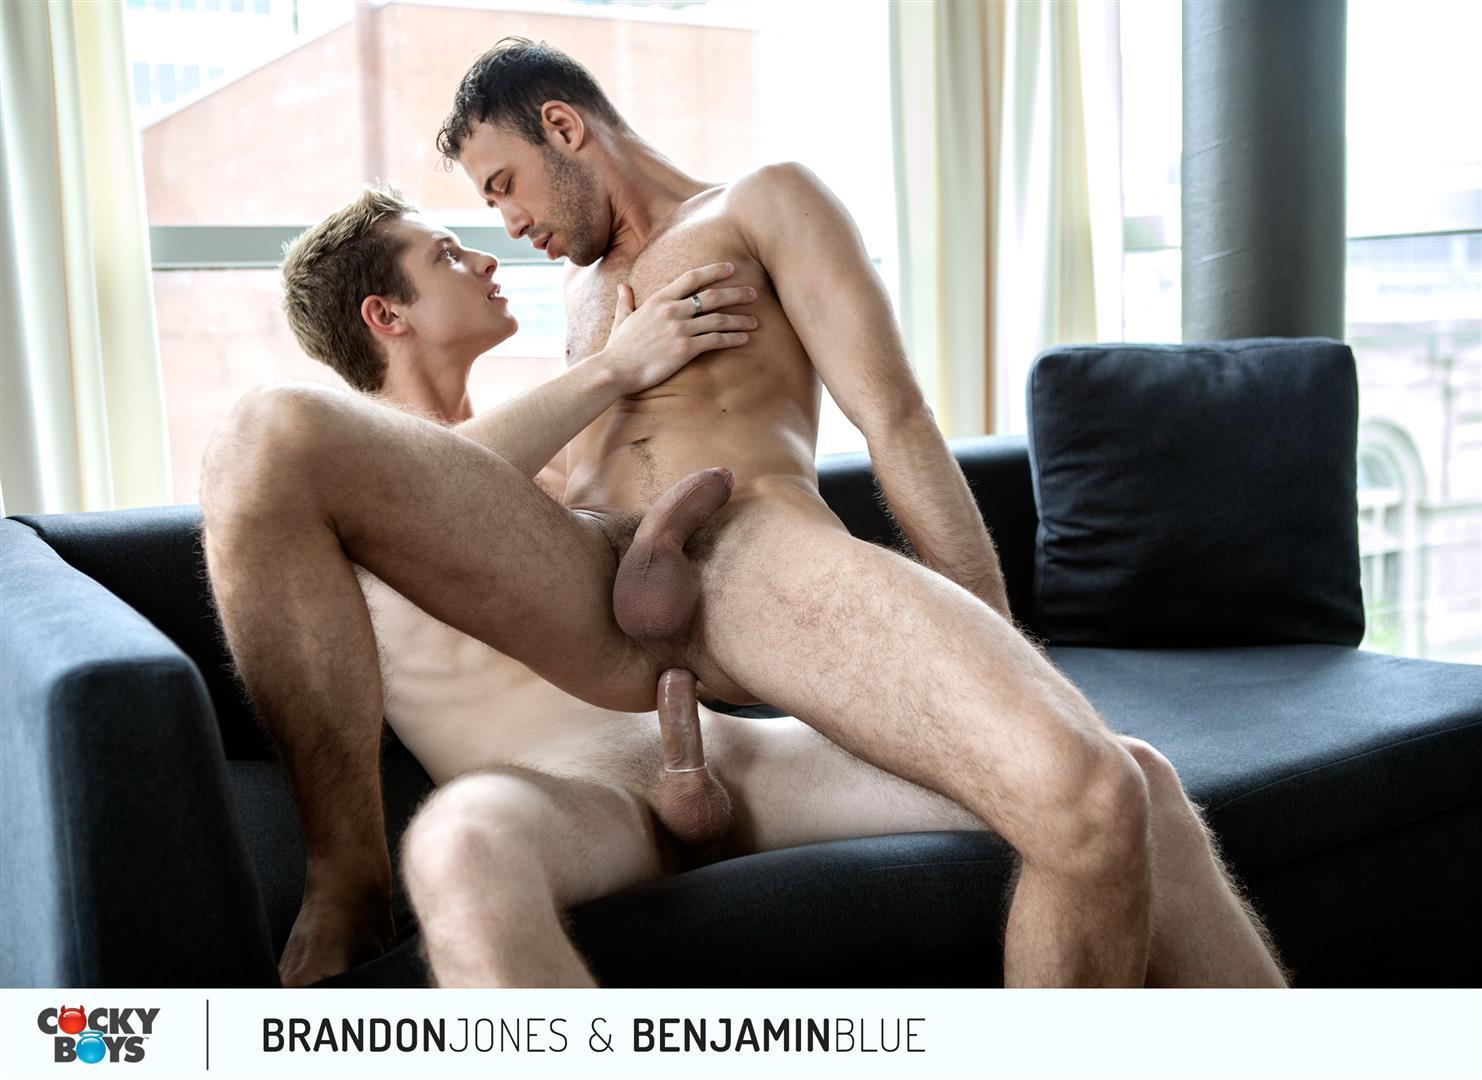 Cockyboys Benjamin Blue and Brandon Jones Flip Flop Fuck Amateur Gay Porn 12 Cockyboys: Benjamin Blue Tops Brandon Jones For The First Time